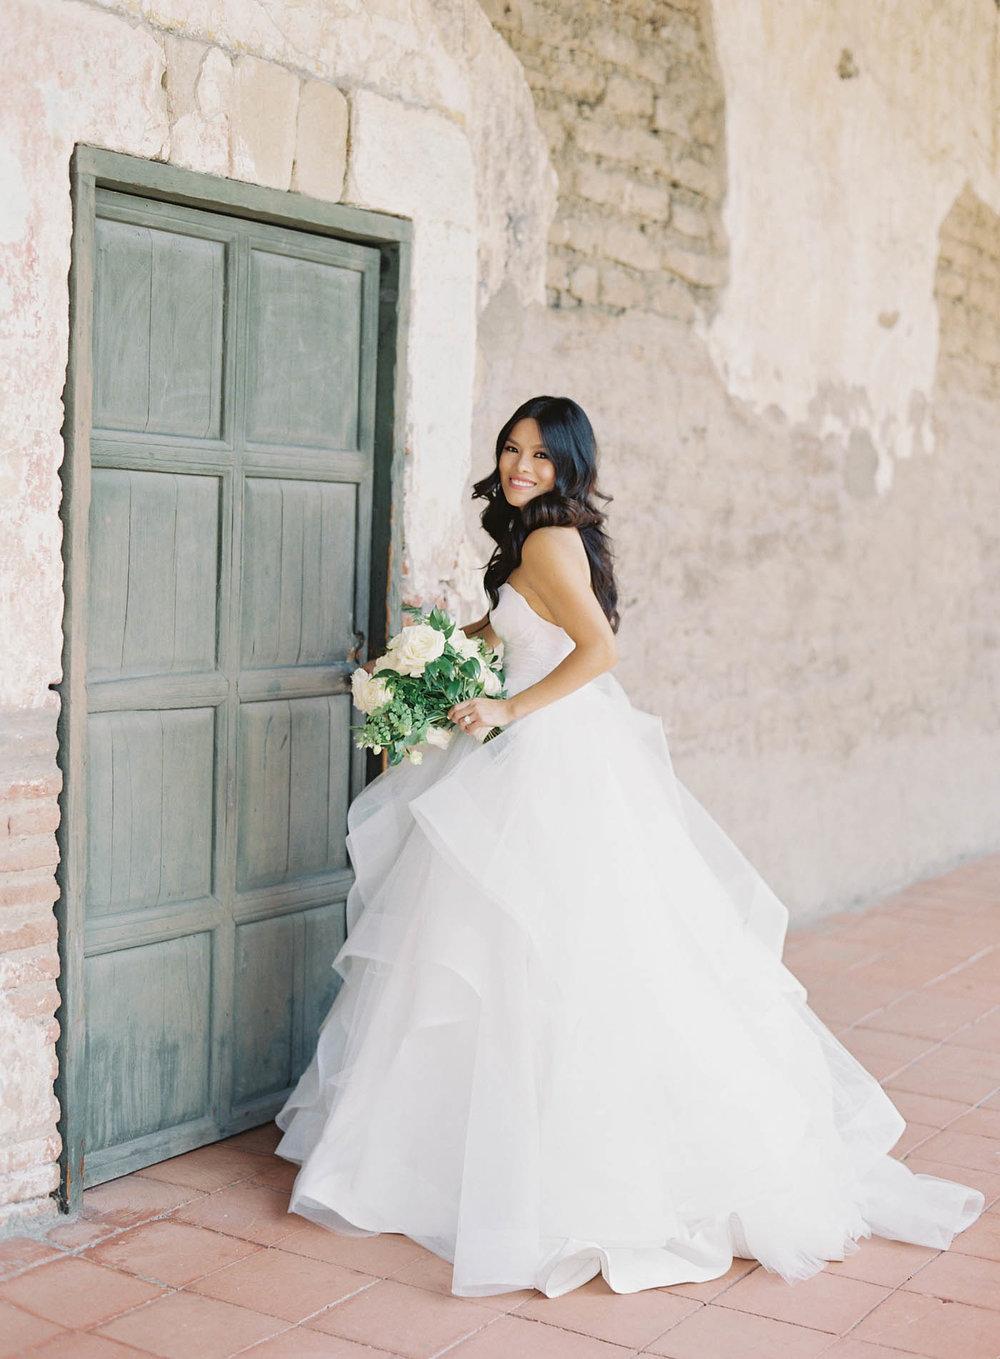 franciscan-gardens-wedding-1-Jen_Huang-000749-R1-008.jpg